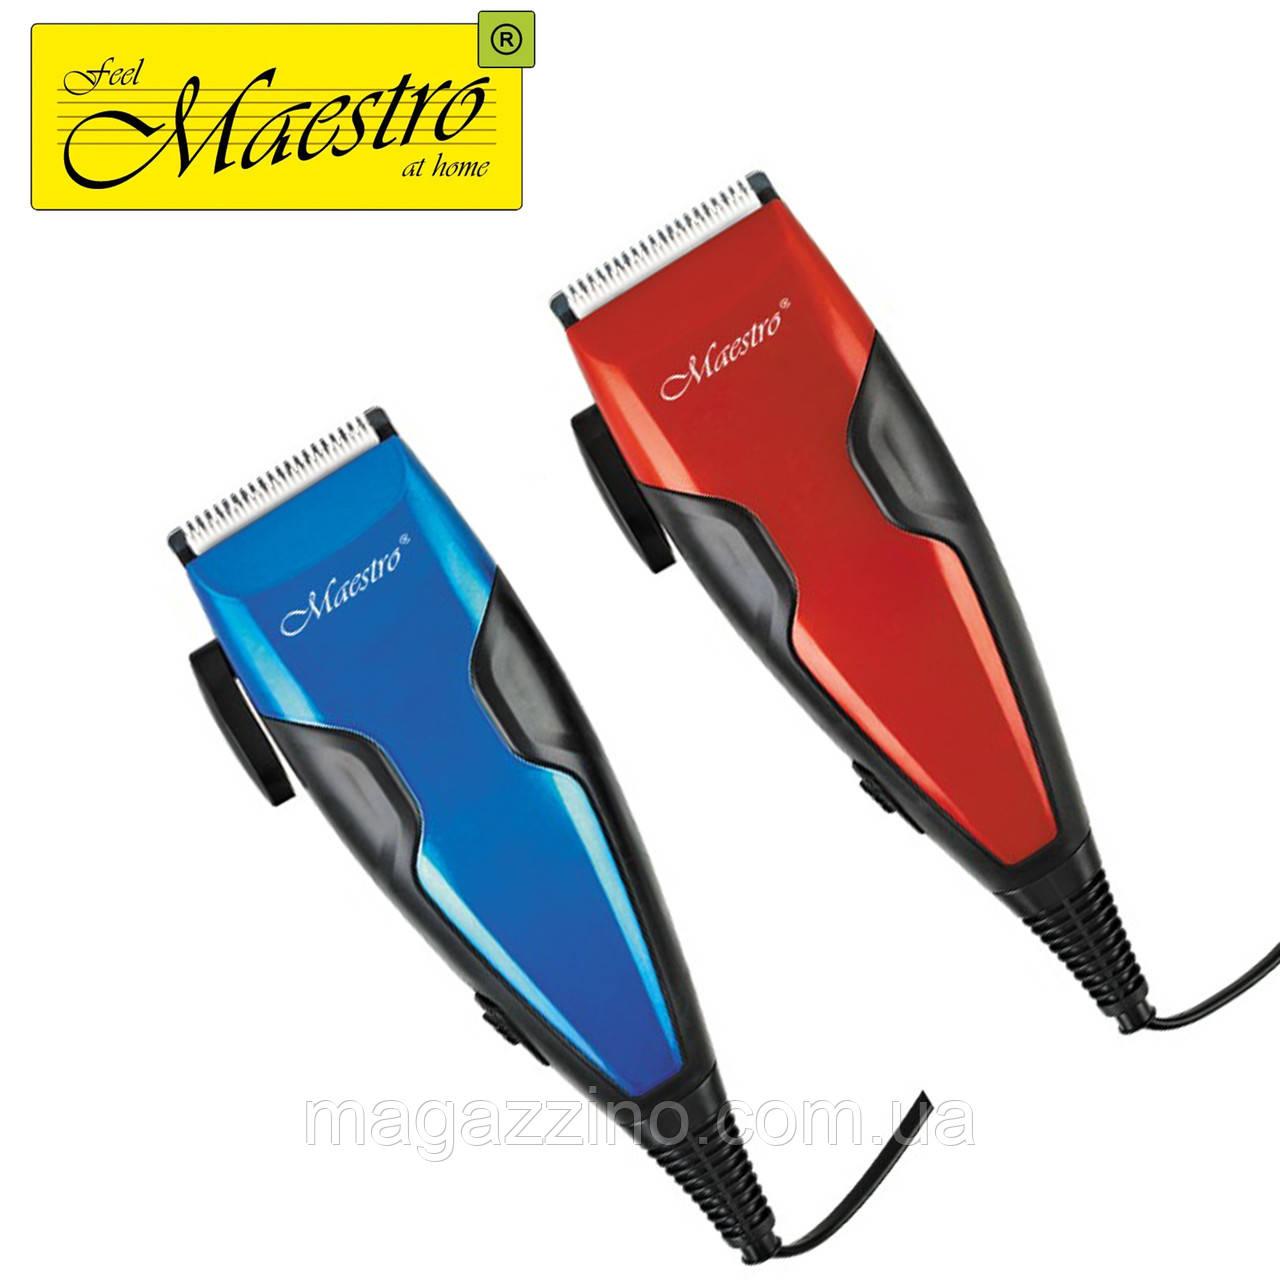 Машинка для стрижки волосся Maestro MR-650C, 15 Вт.